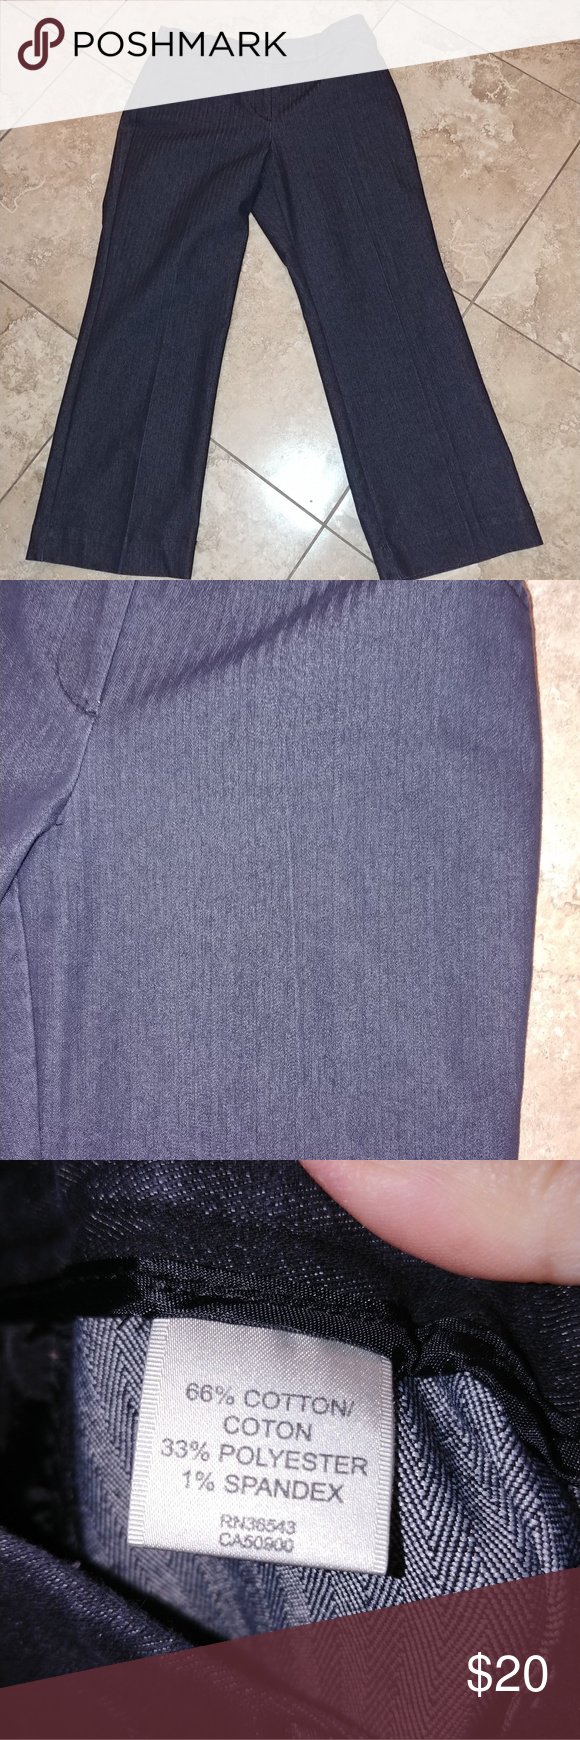 LAST CHANCE{van heusen} trouser jeans Van Heusen Size 12 R Nice denim trouser pants Wide legs at bottom Dark blue denim rinse Stretch ************** Van Heusen Pants Trousers